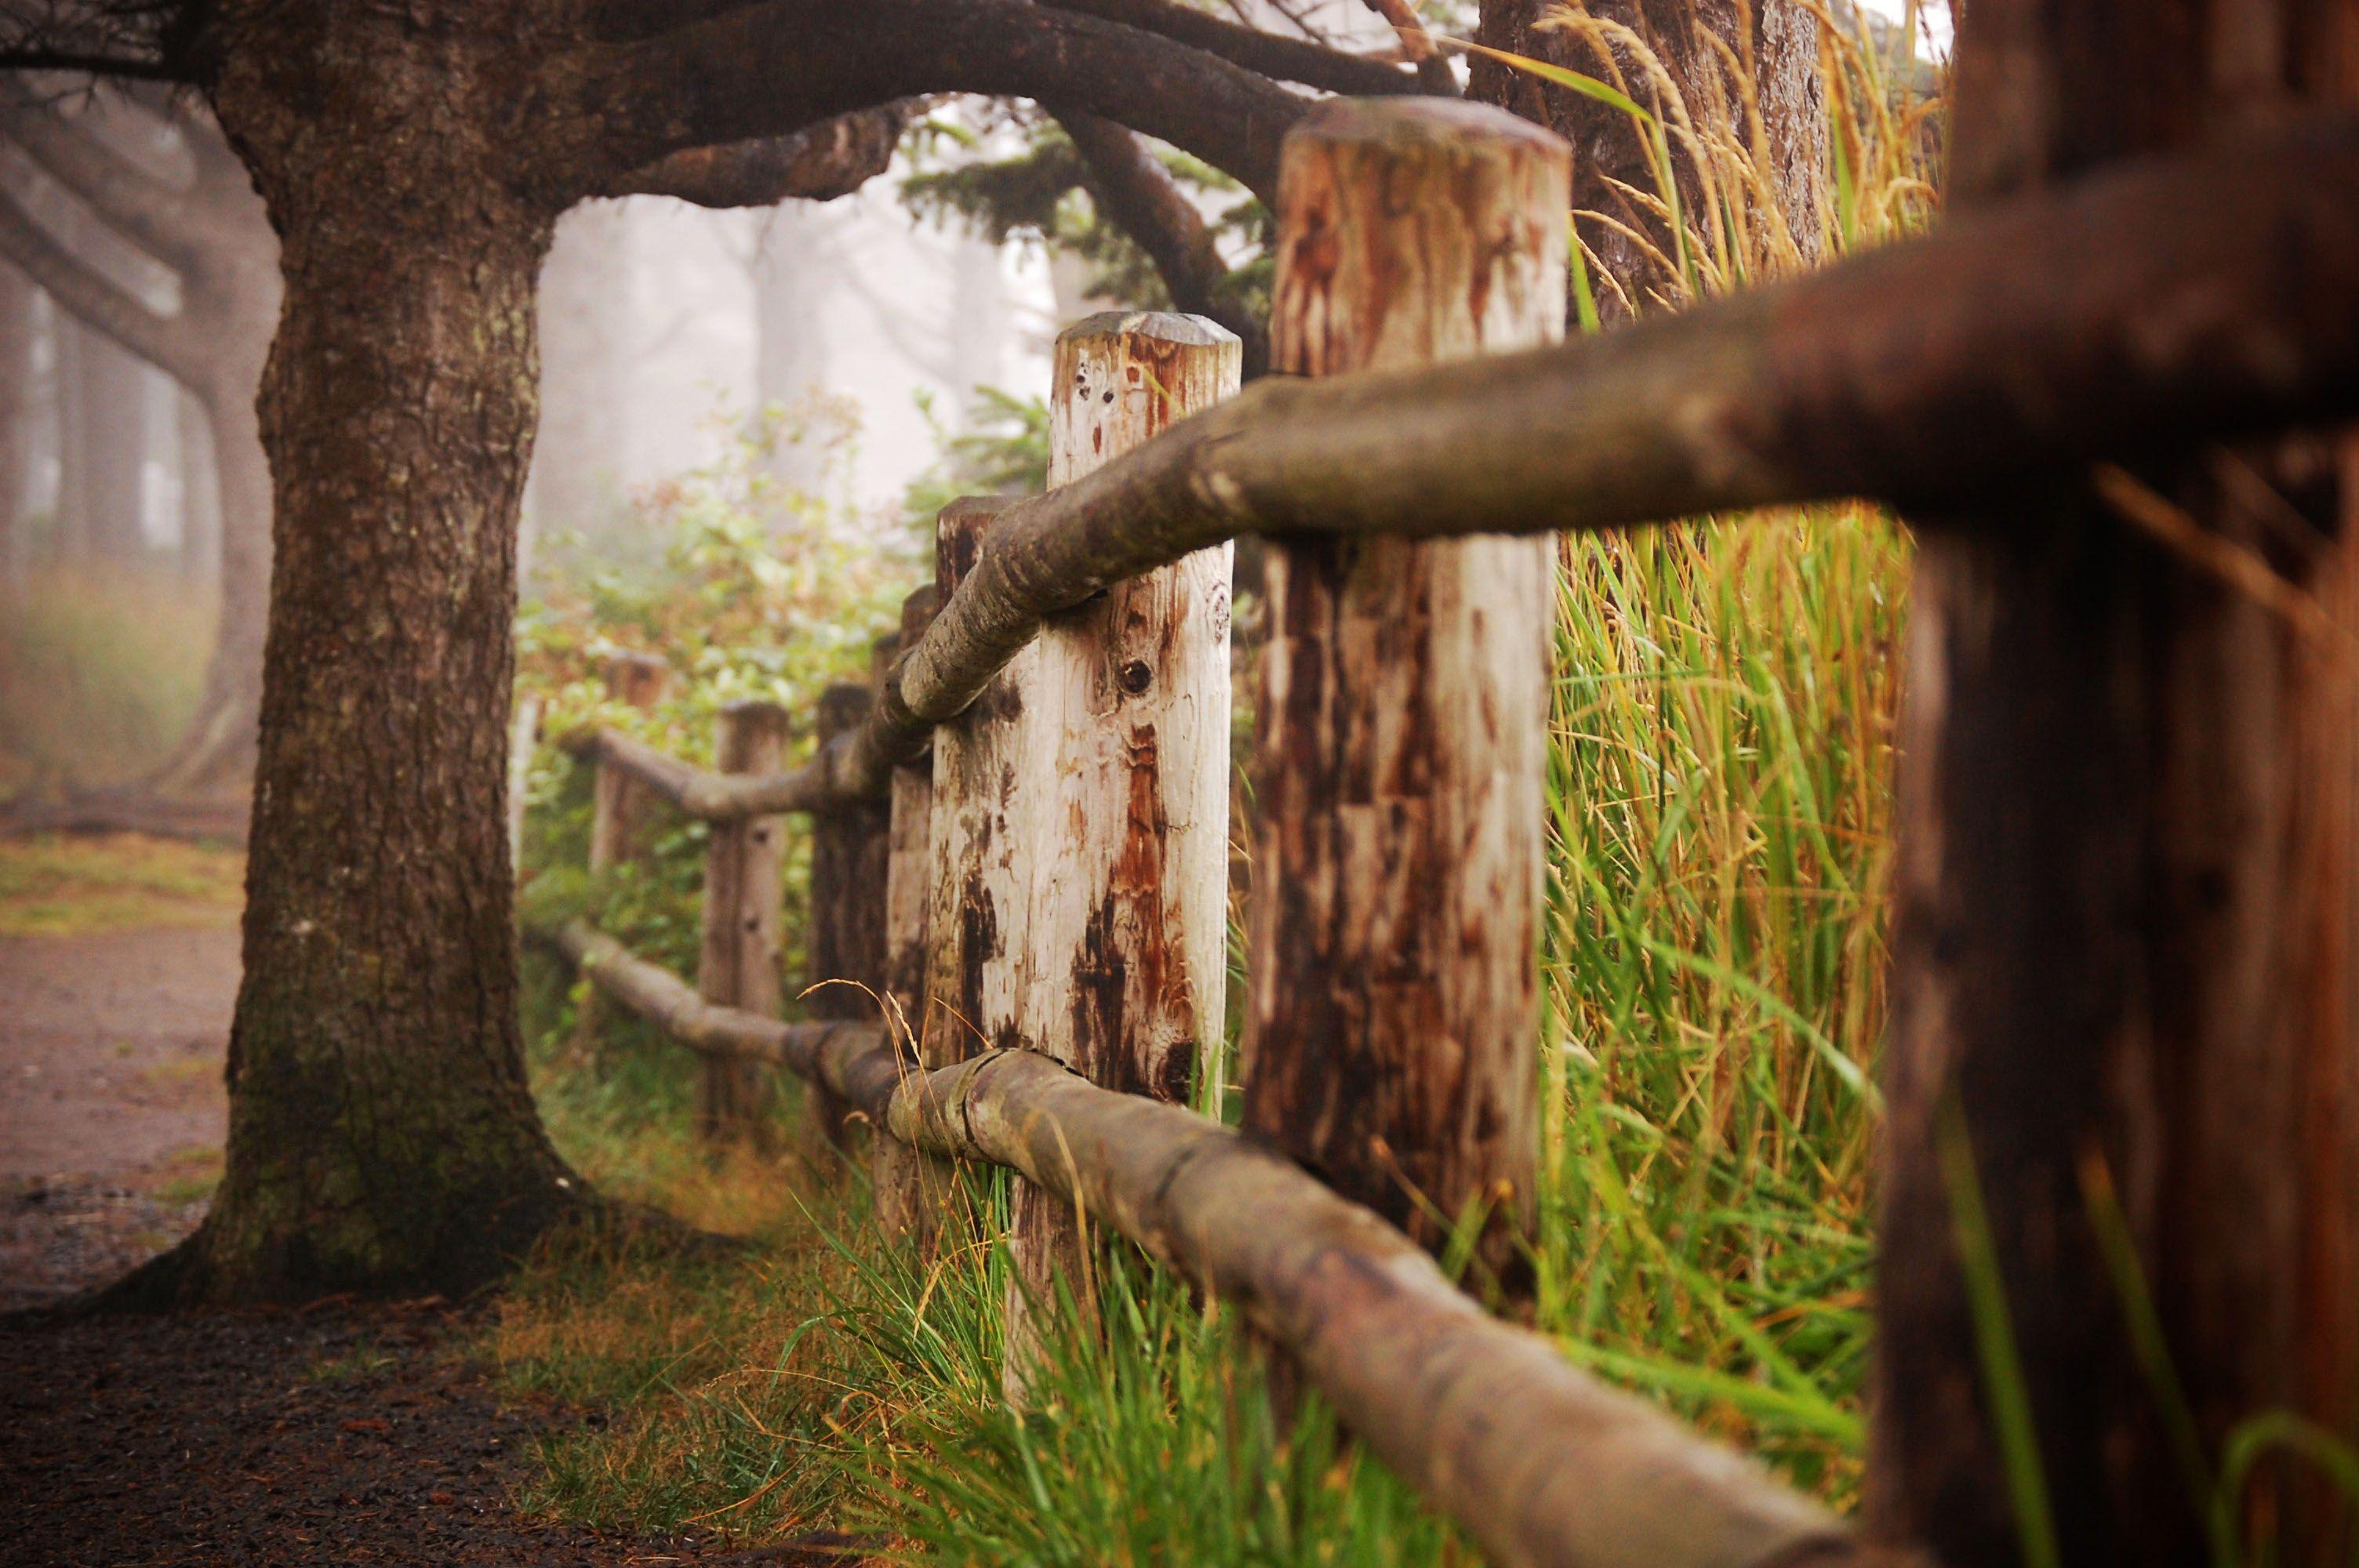 Arcadia Beach, Oregon foot path. I love this old fence